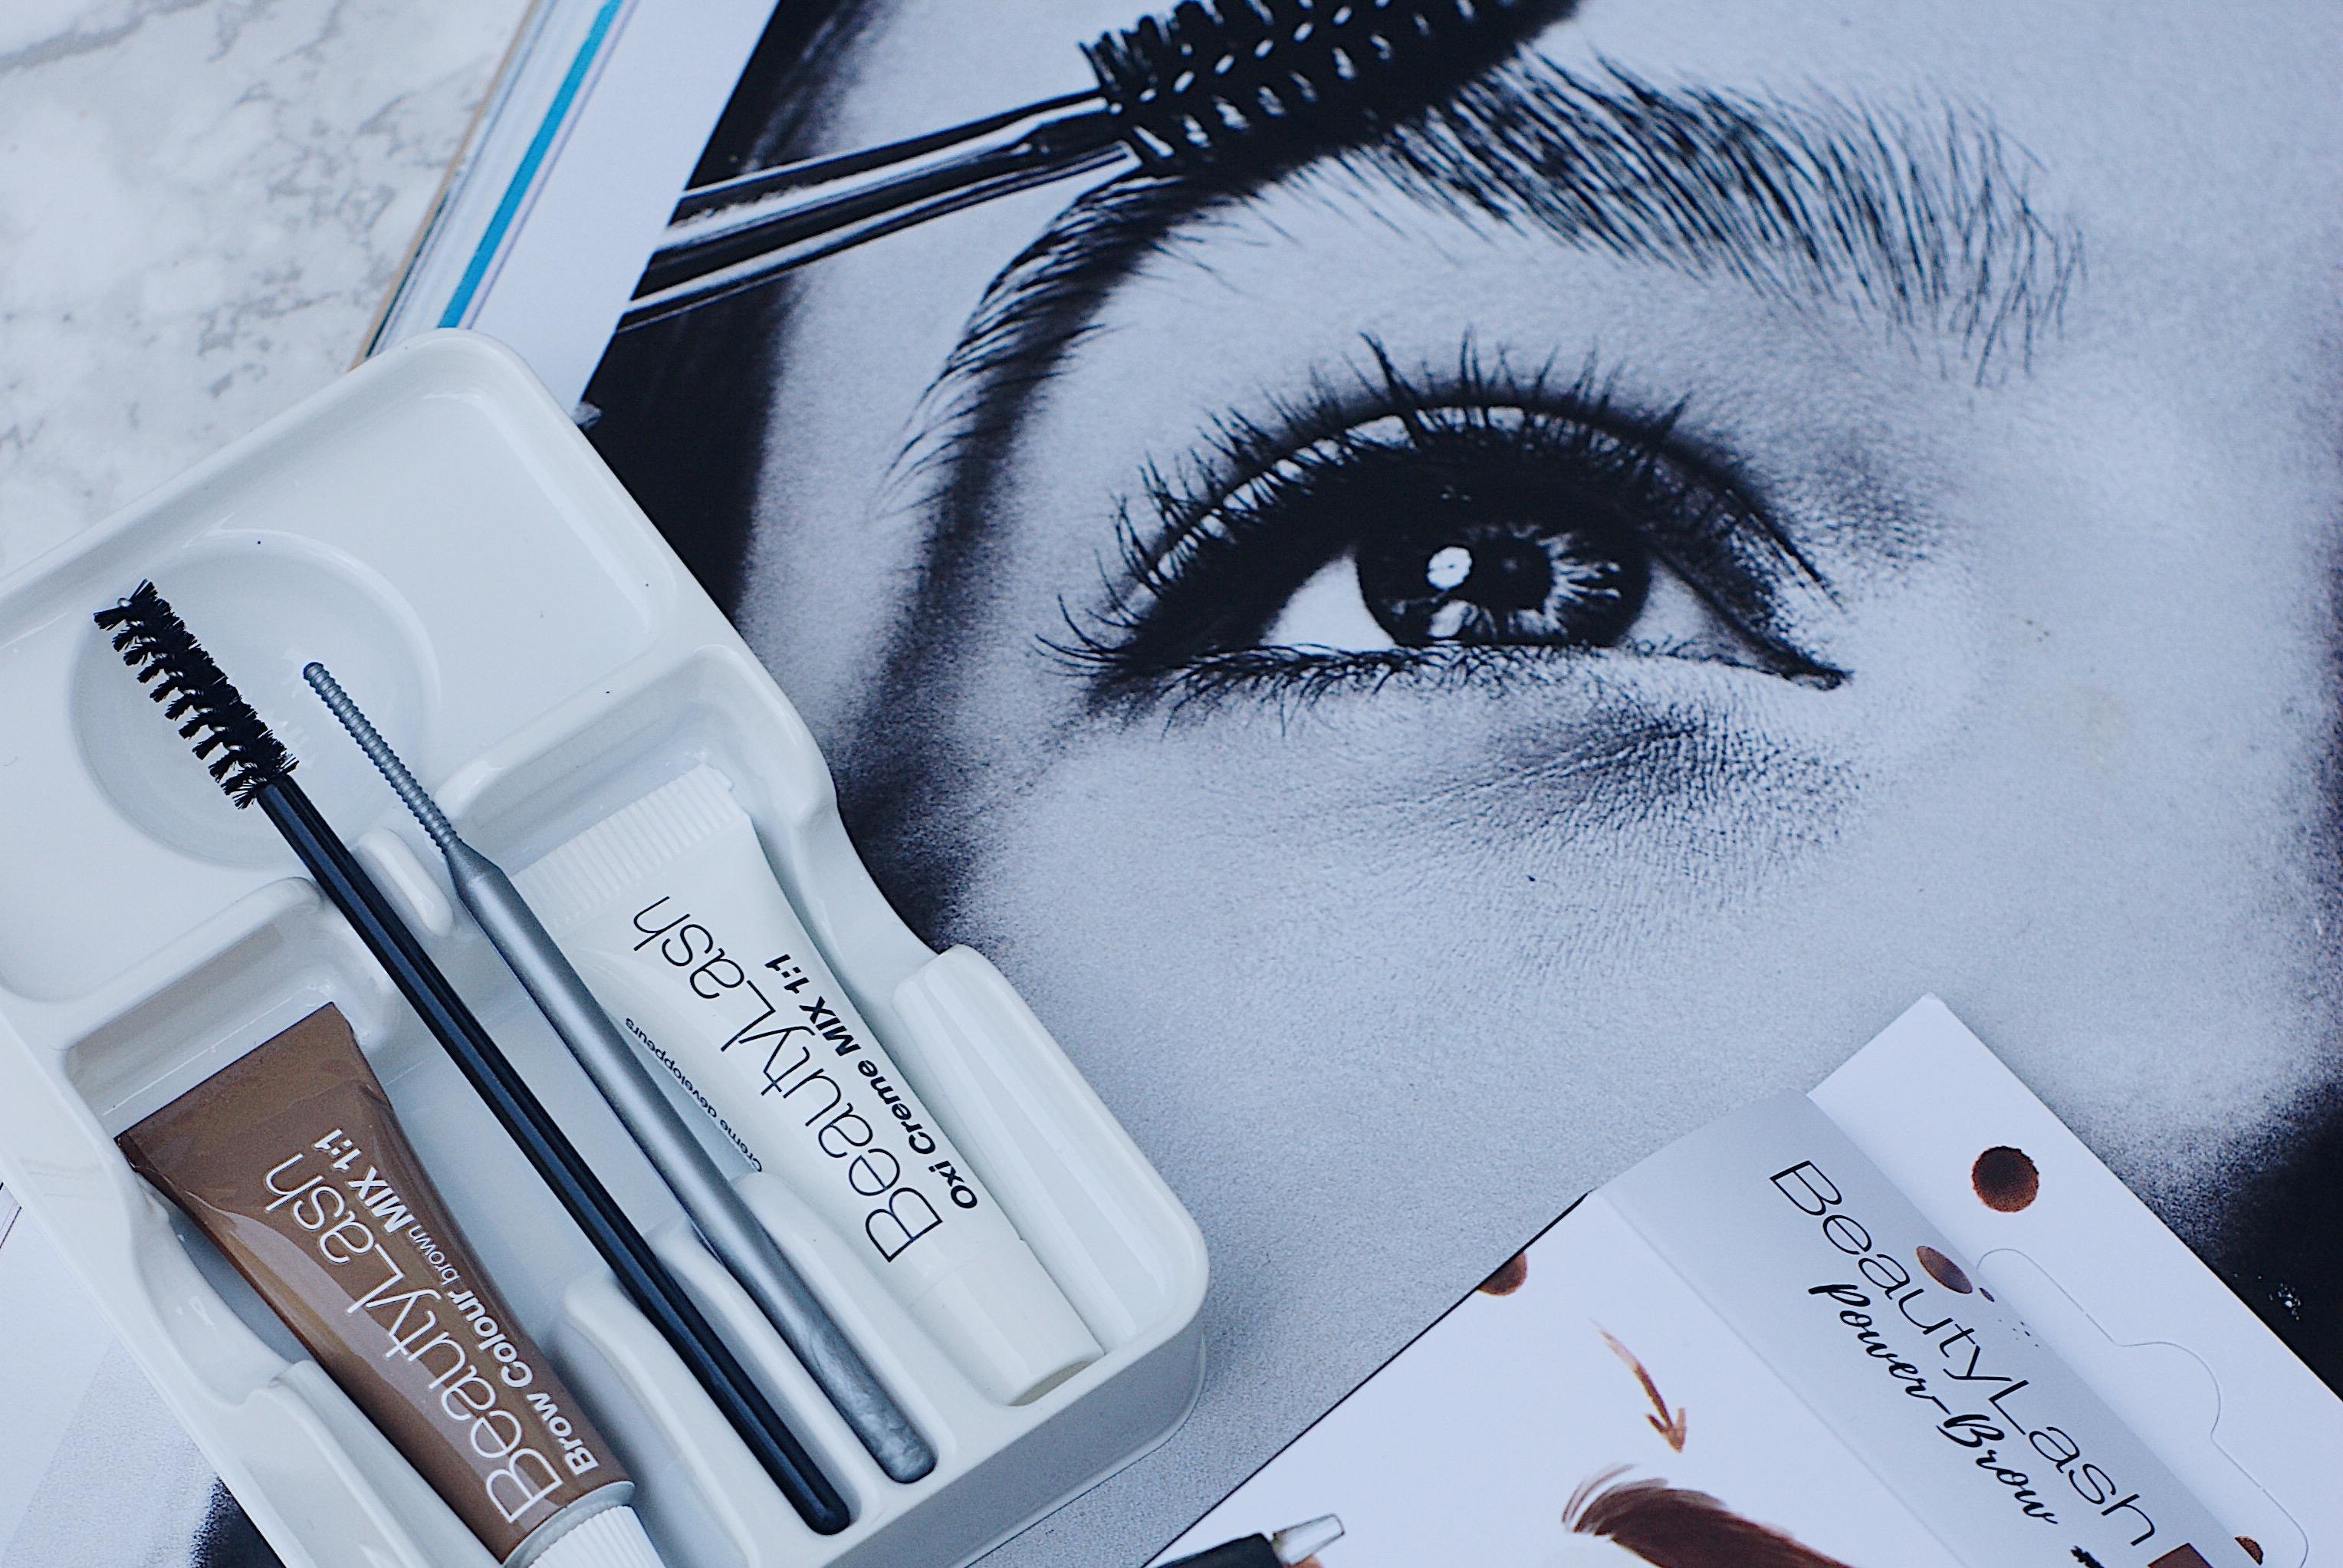 Beauty Lash Augenbrauen selbst färben